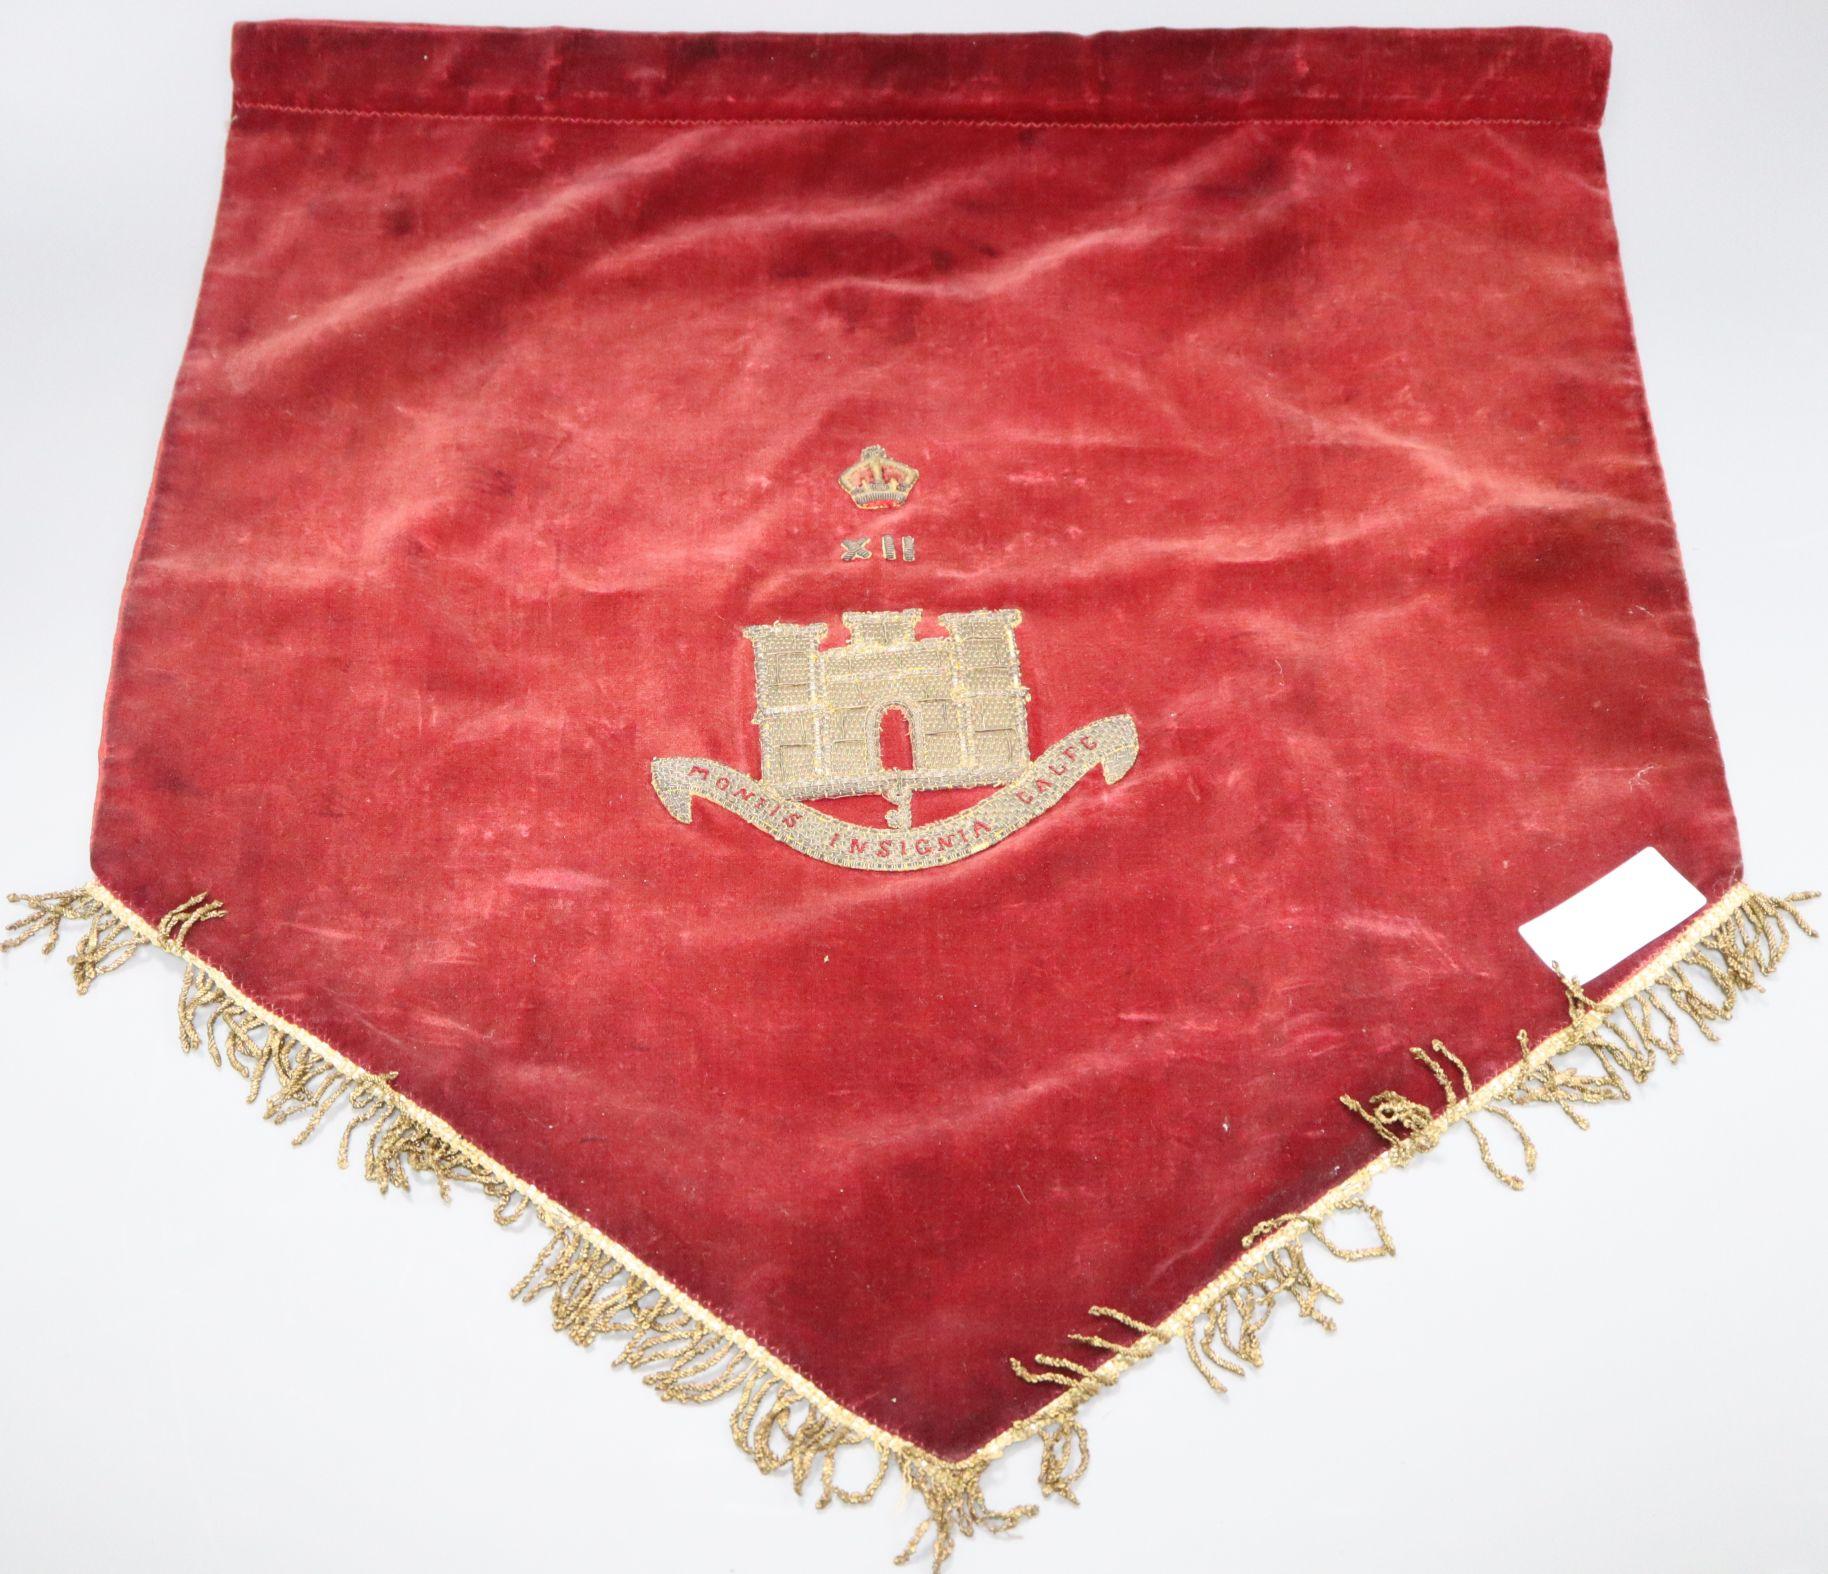 Lot 32 - A velvet Essex Regimental banner